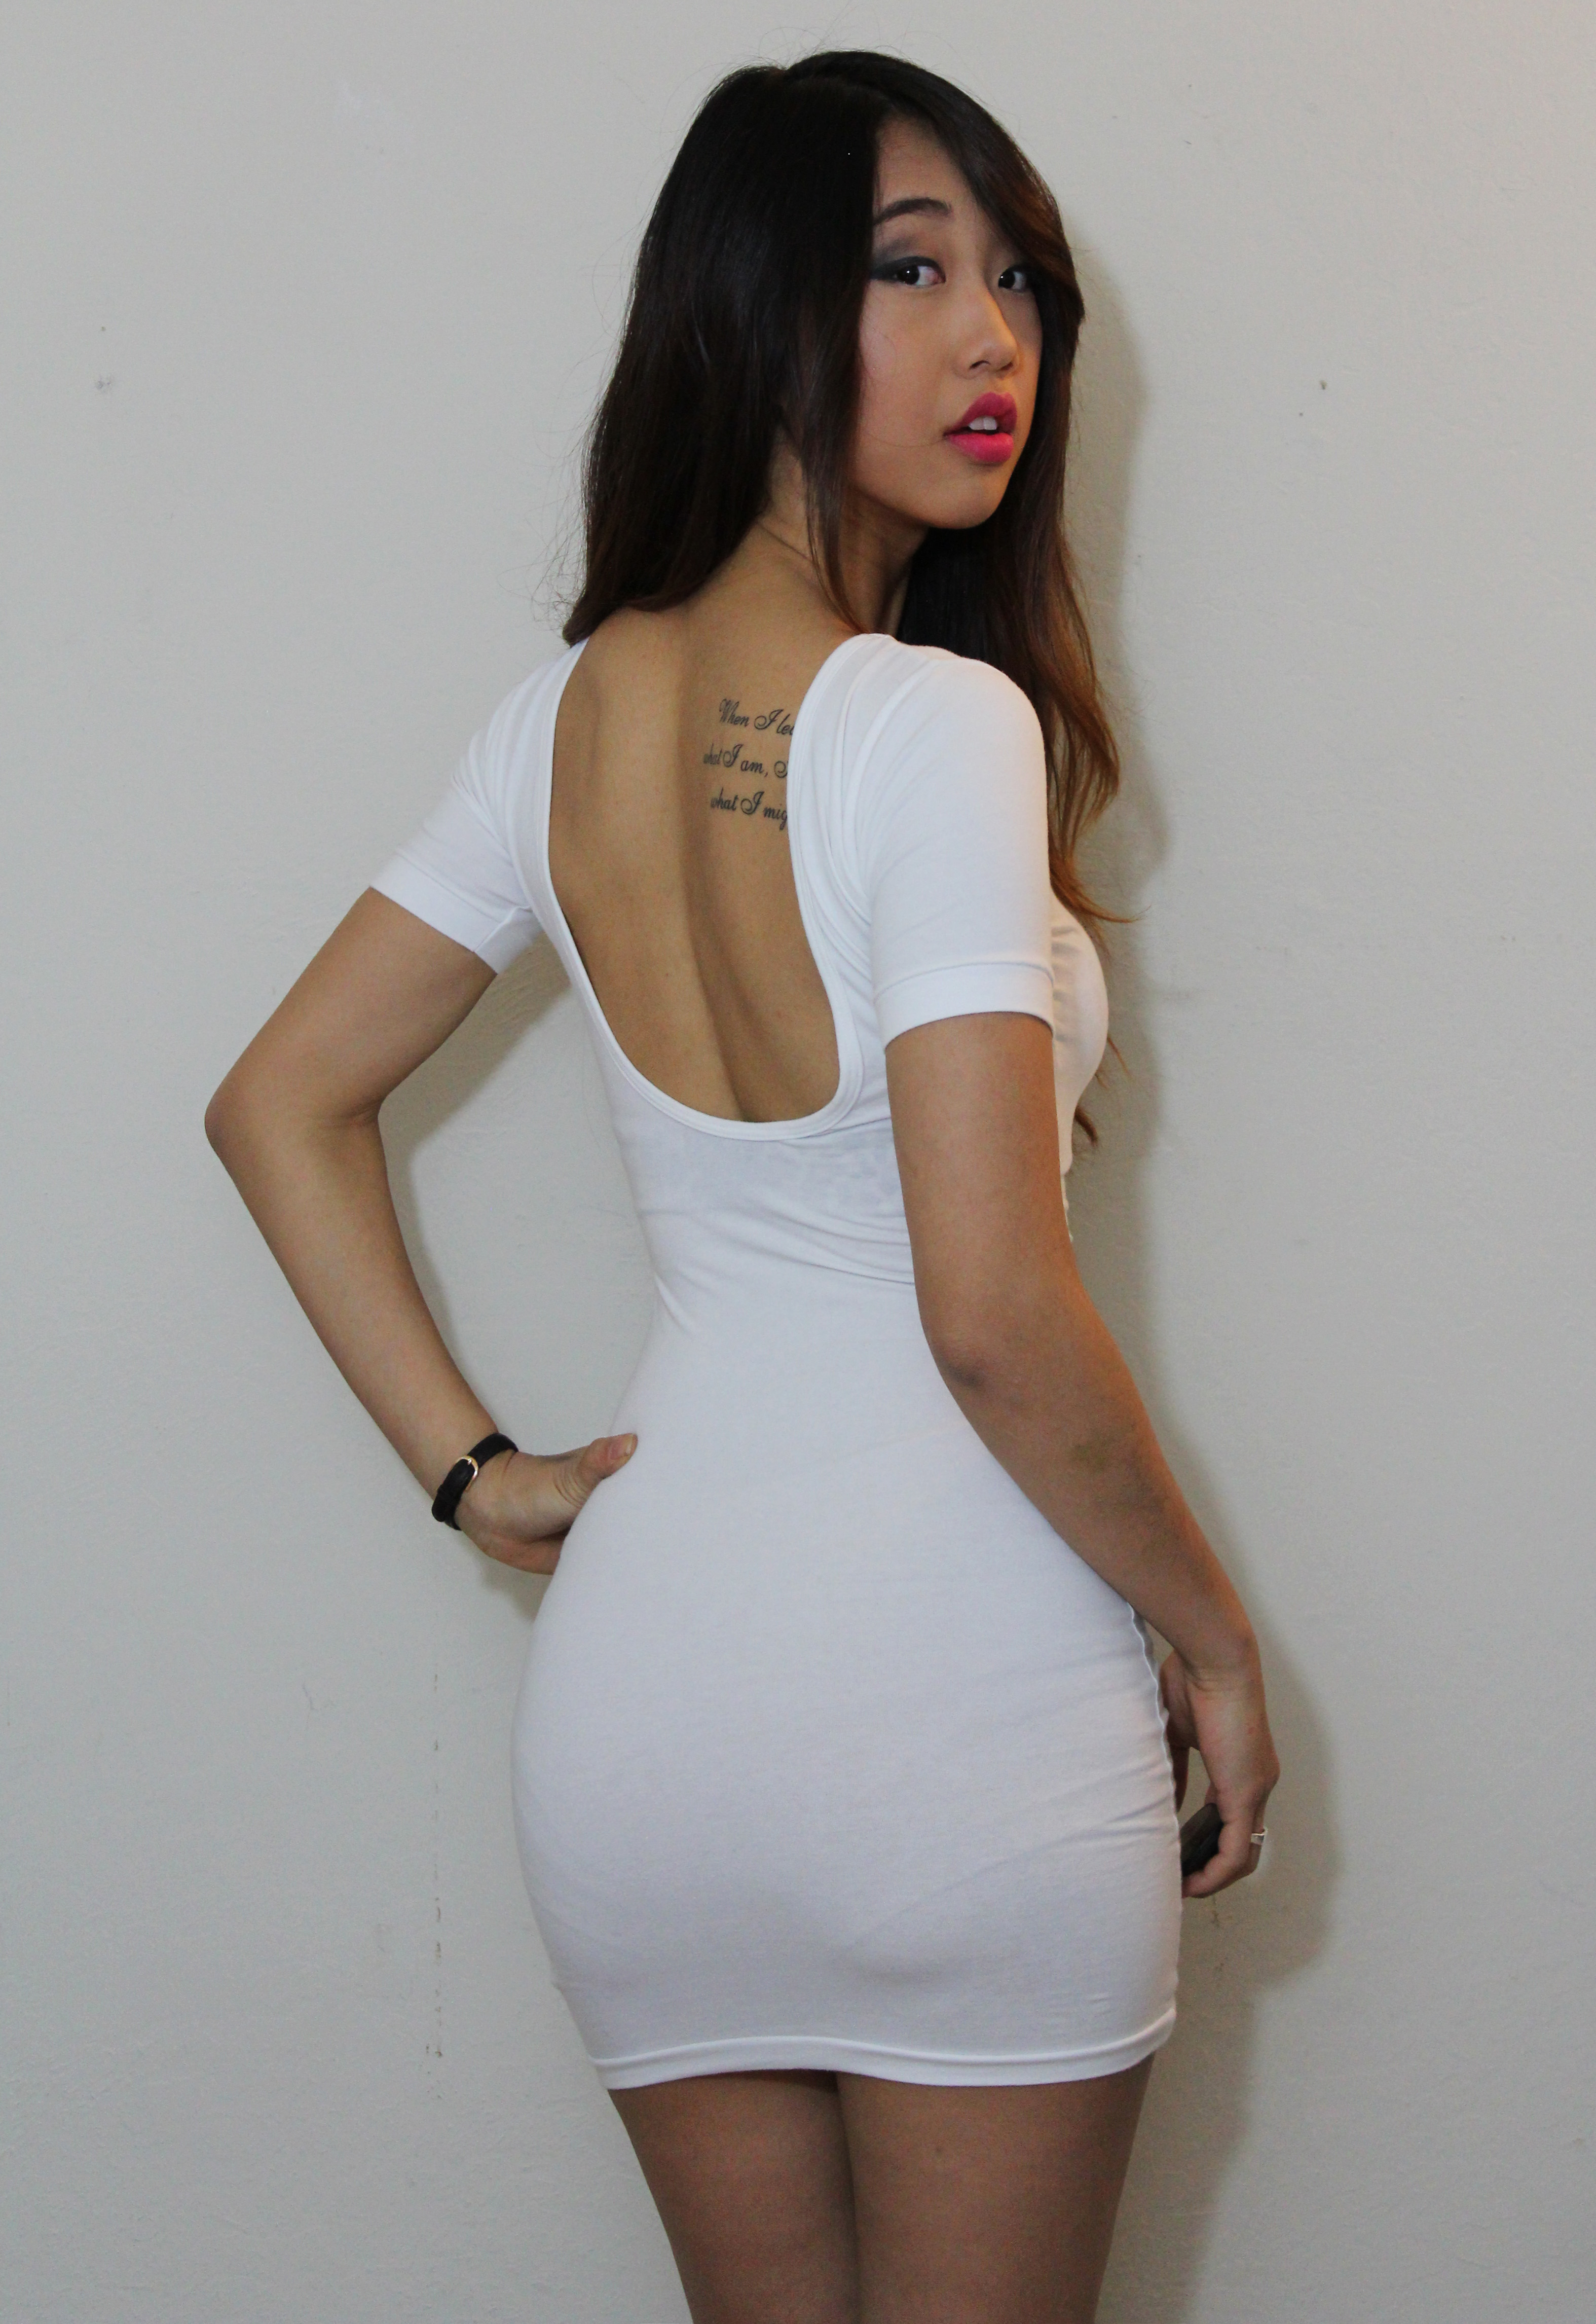 Dip Down Dress on Storenvy 173c247ea